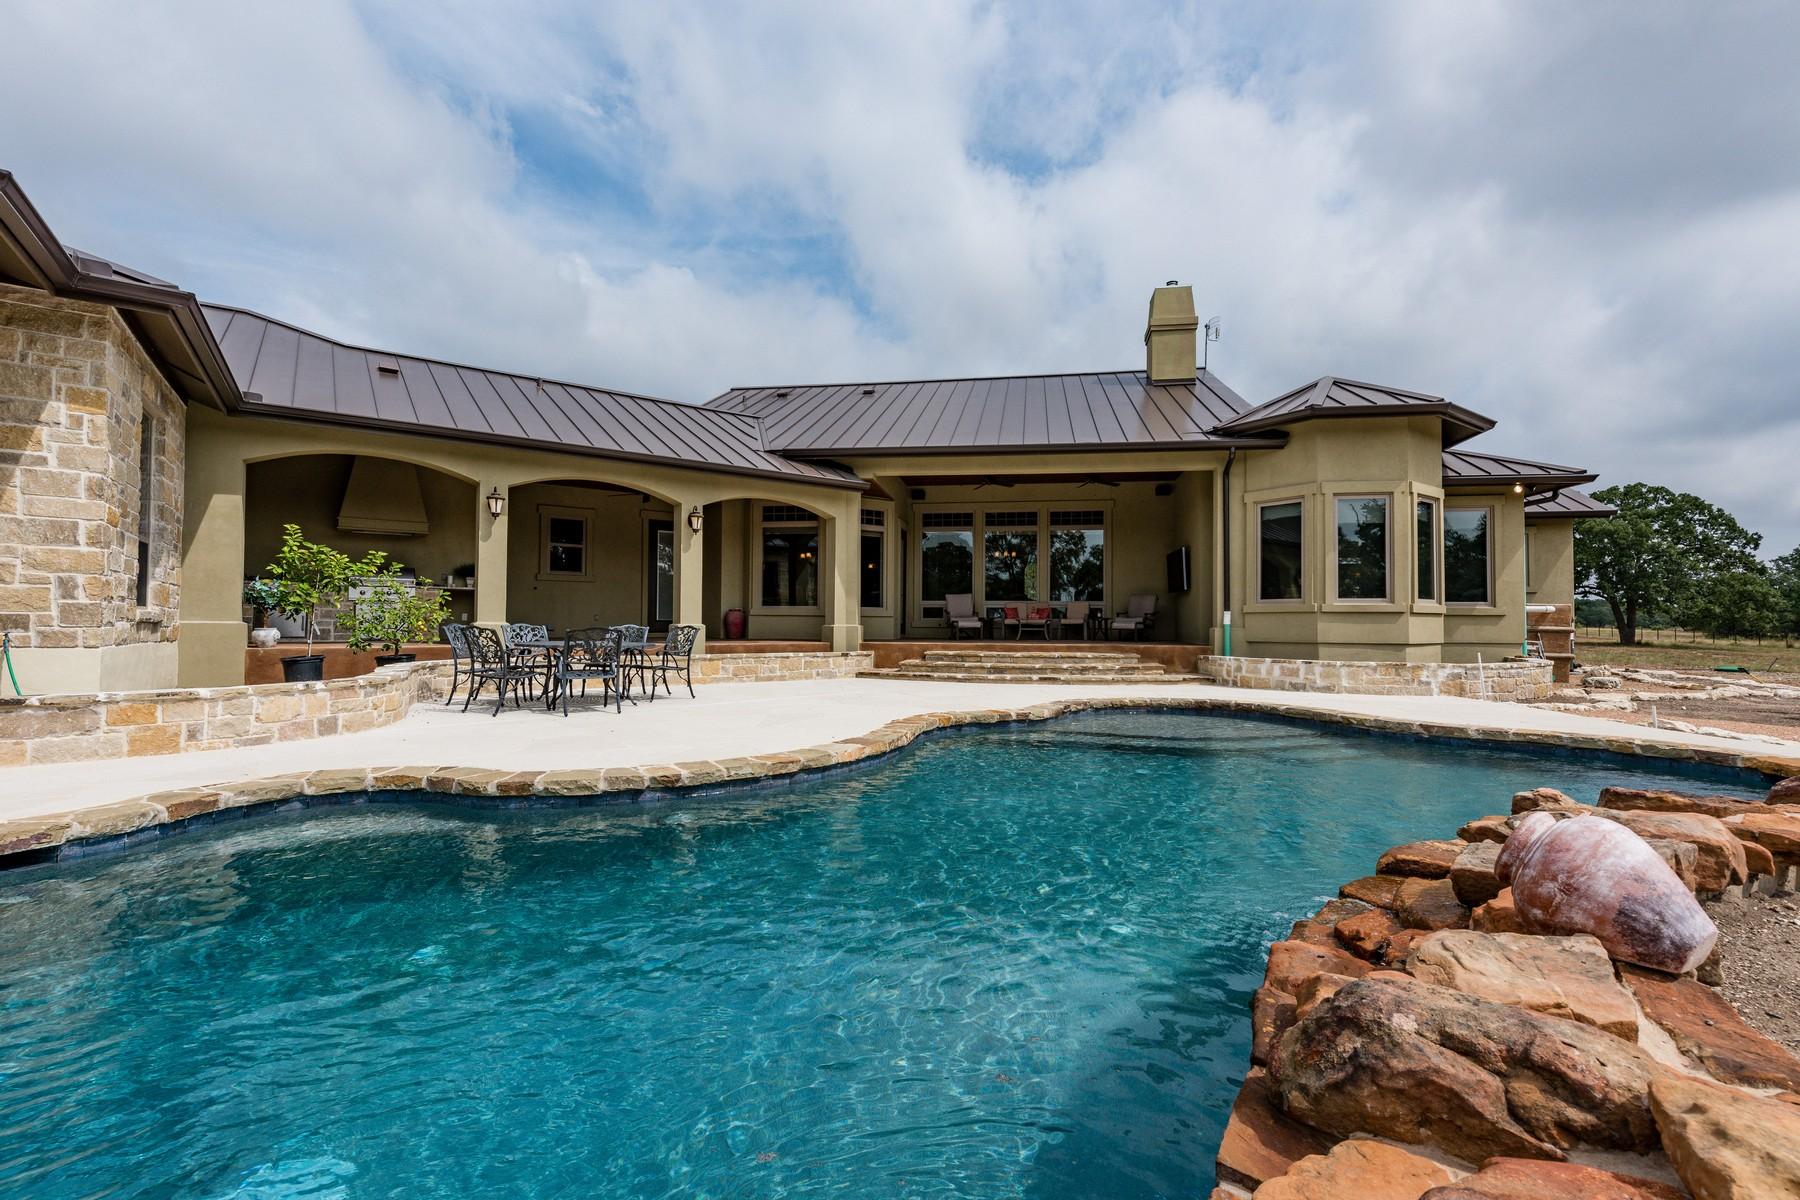 Single Family Home for Sale at 194 Landing Lane, Blanco 194 Landing Ln Blanco, Texas 78606 United States